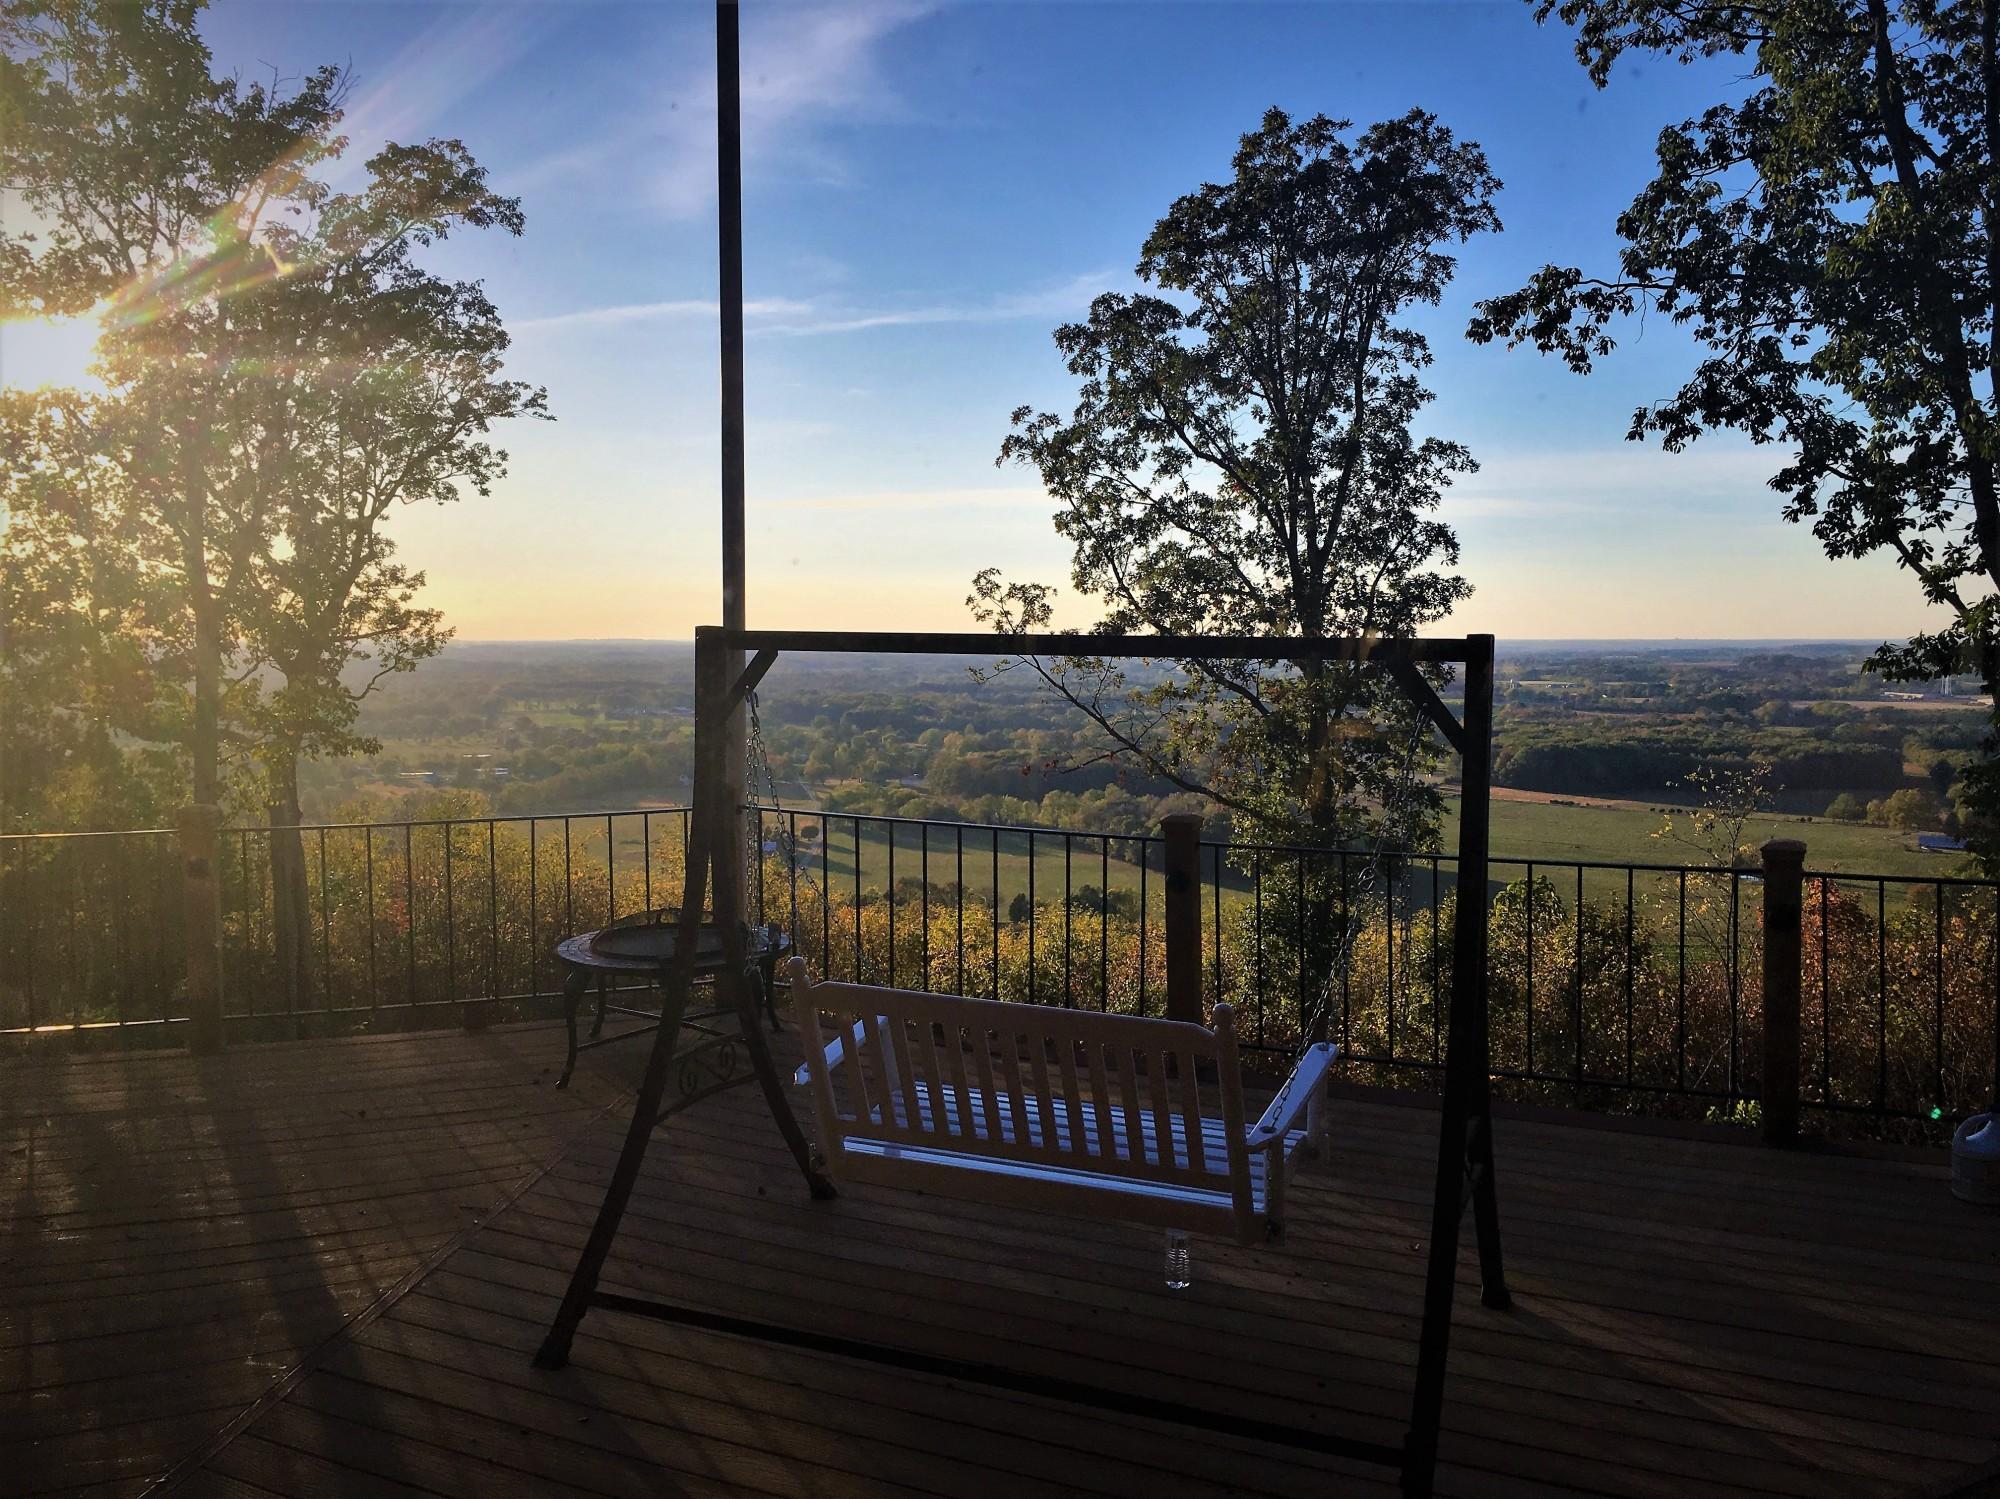 2018 Pelham Pointe Vacation Rental Cabin Monteagle